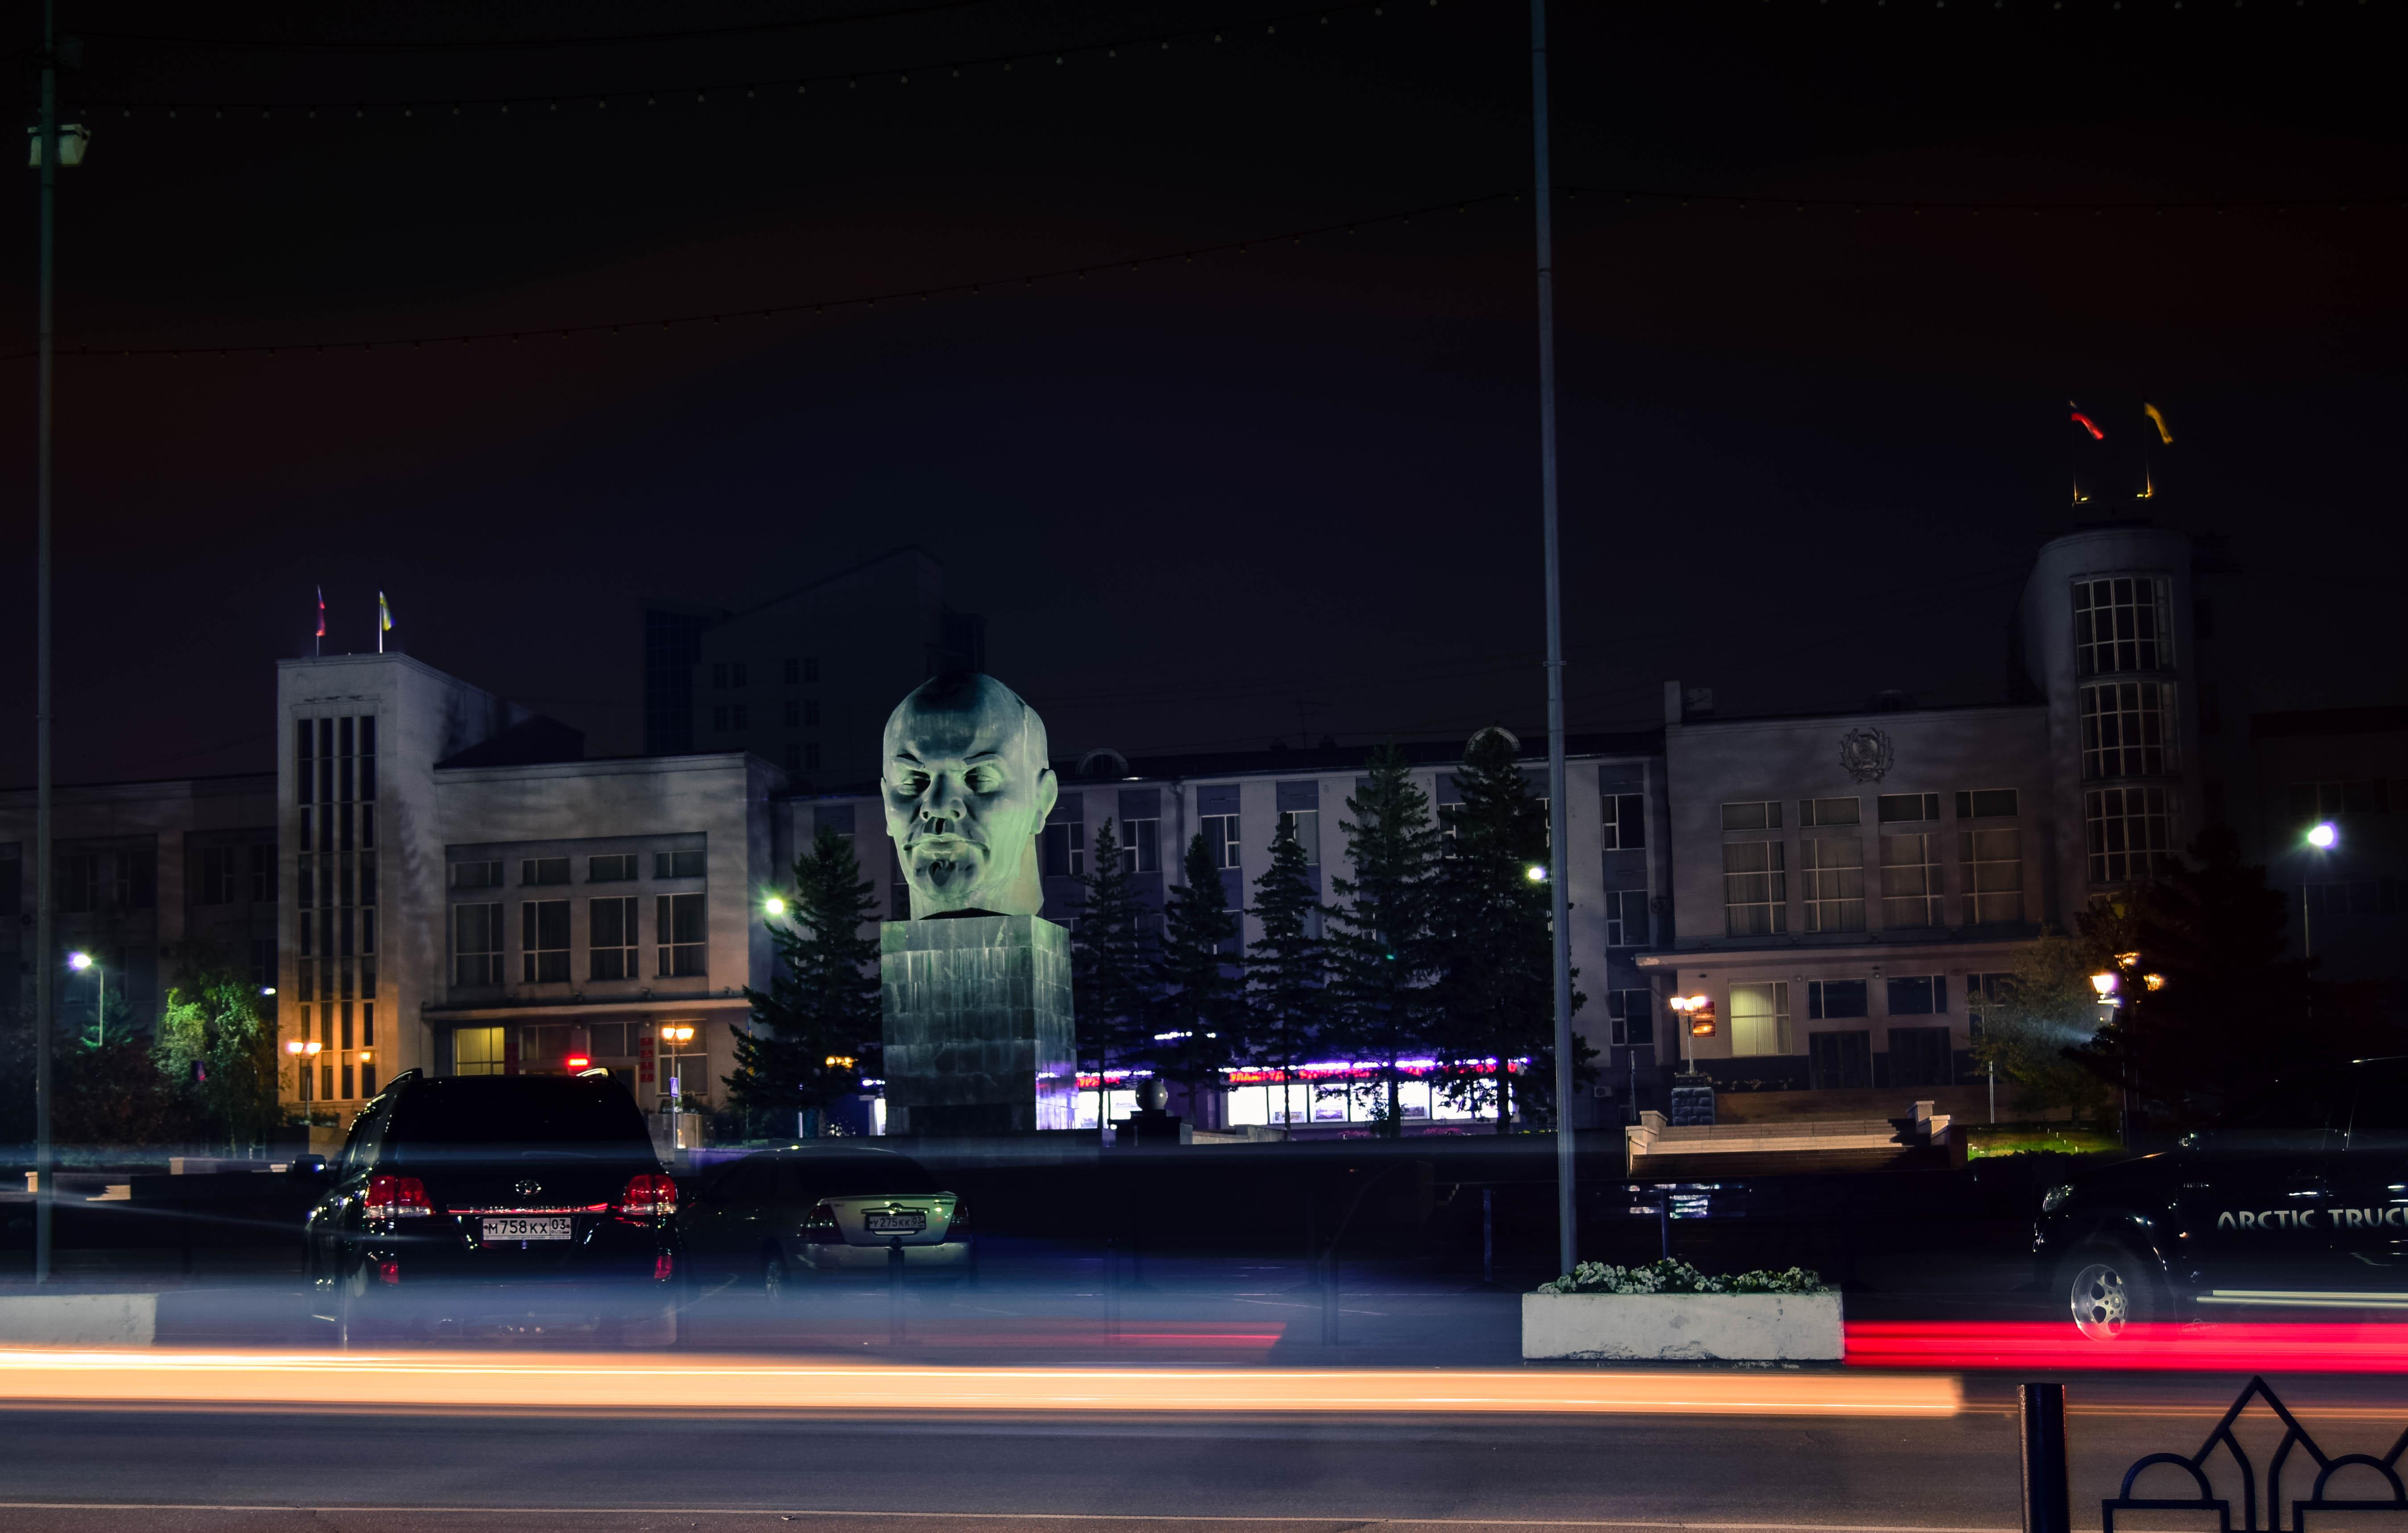 24092016-Irkutsk-22